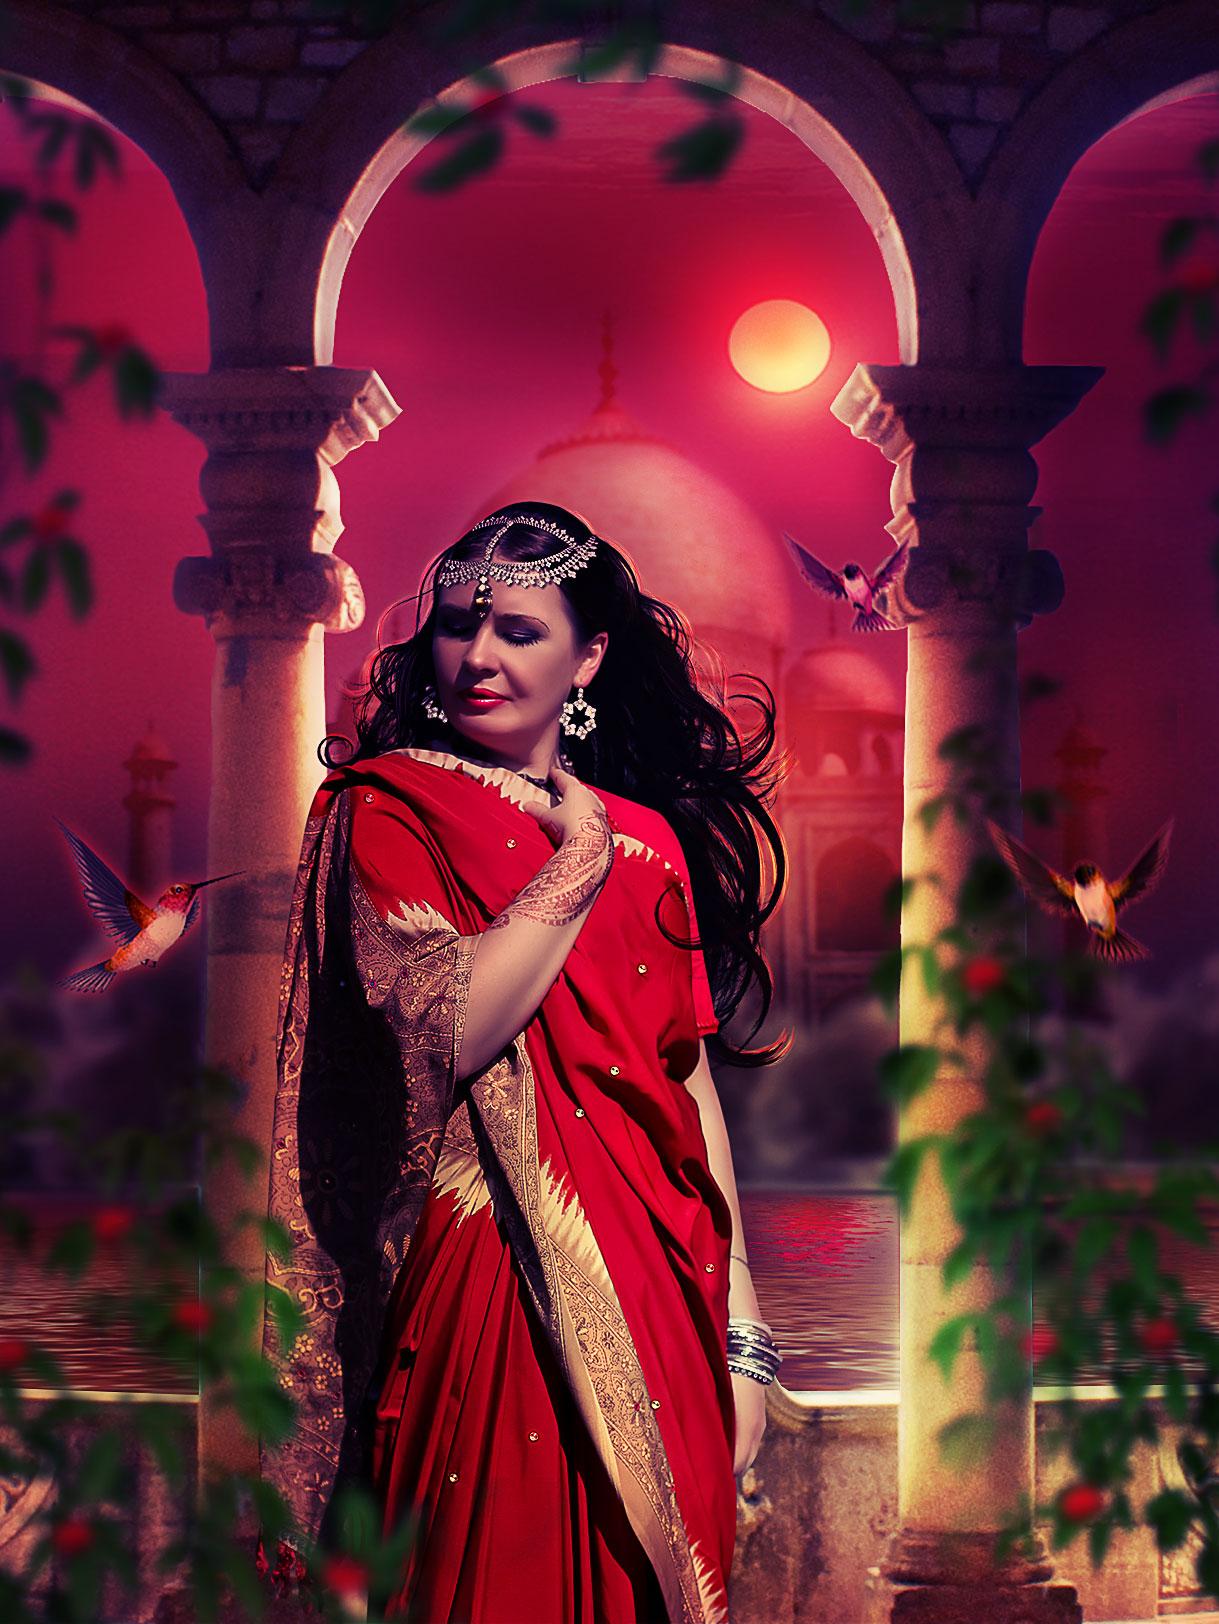 Indian princess by TatyanaHappy